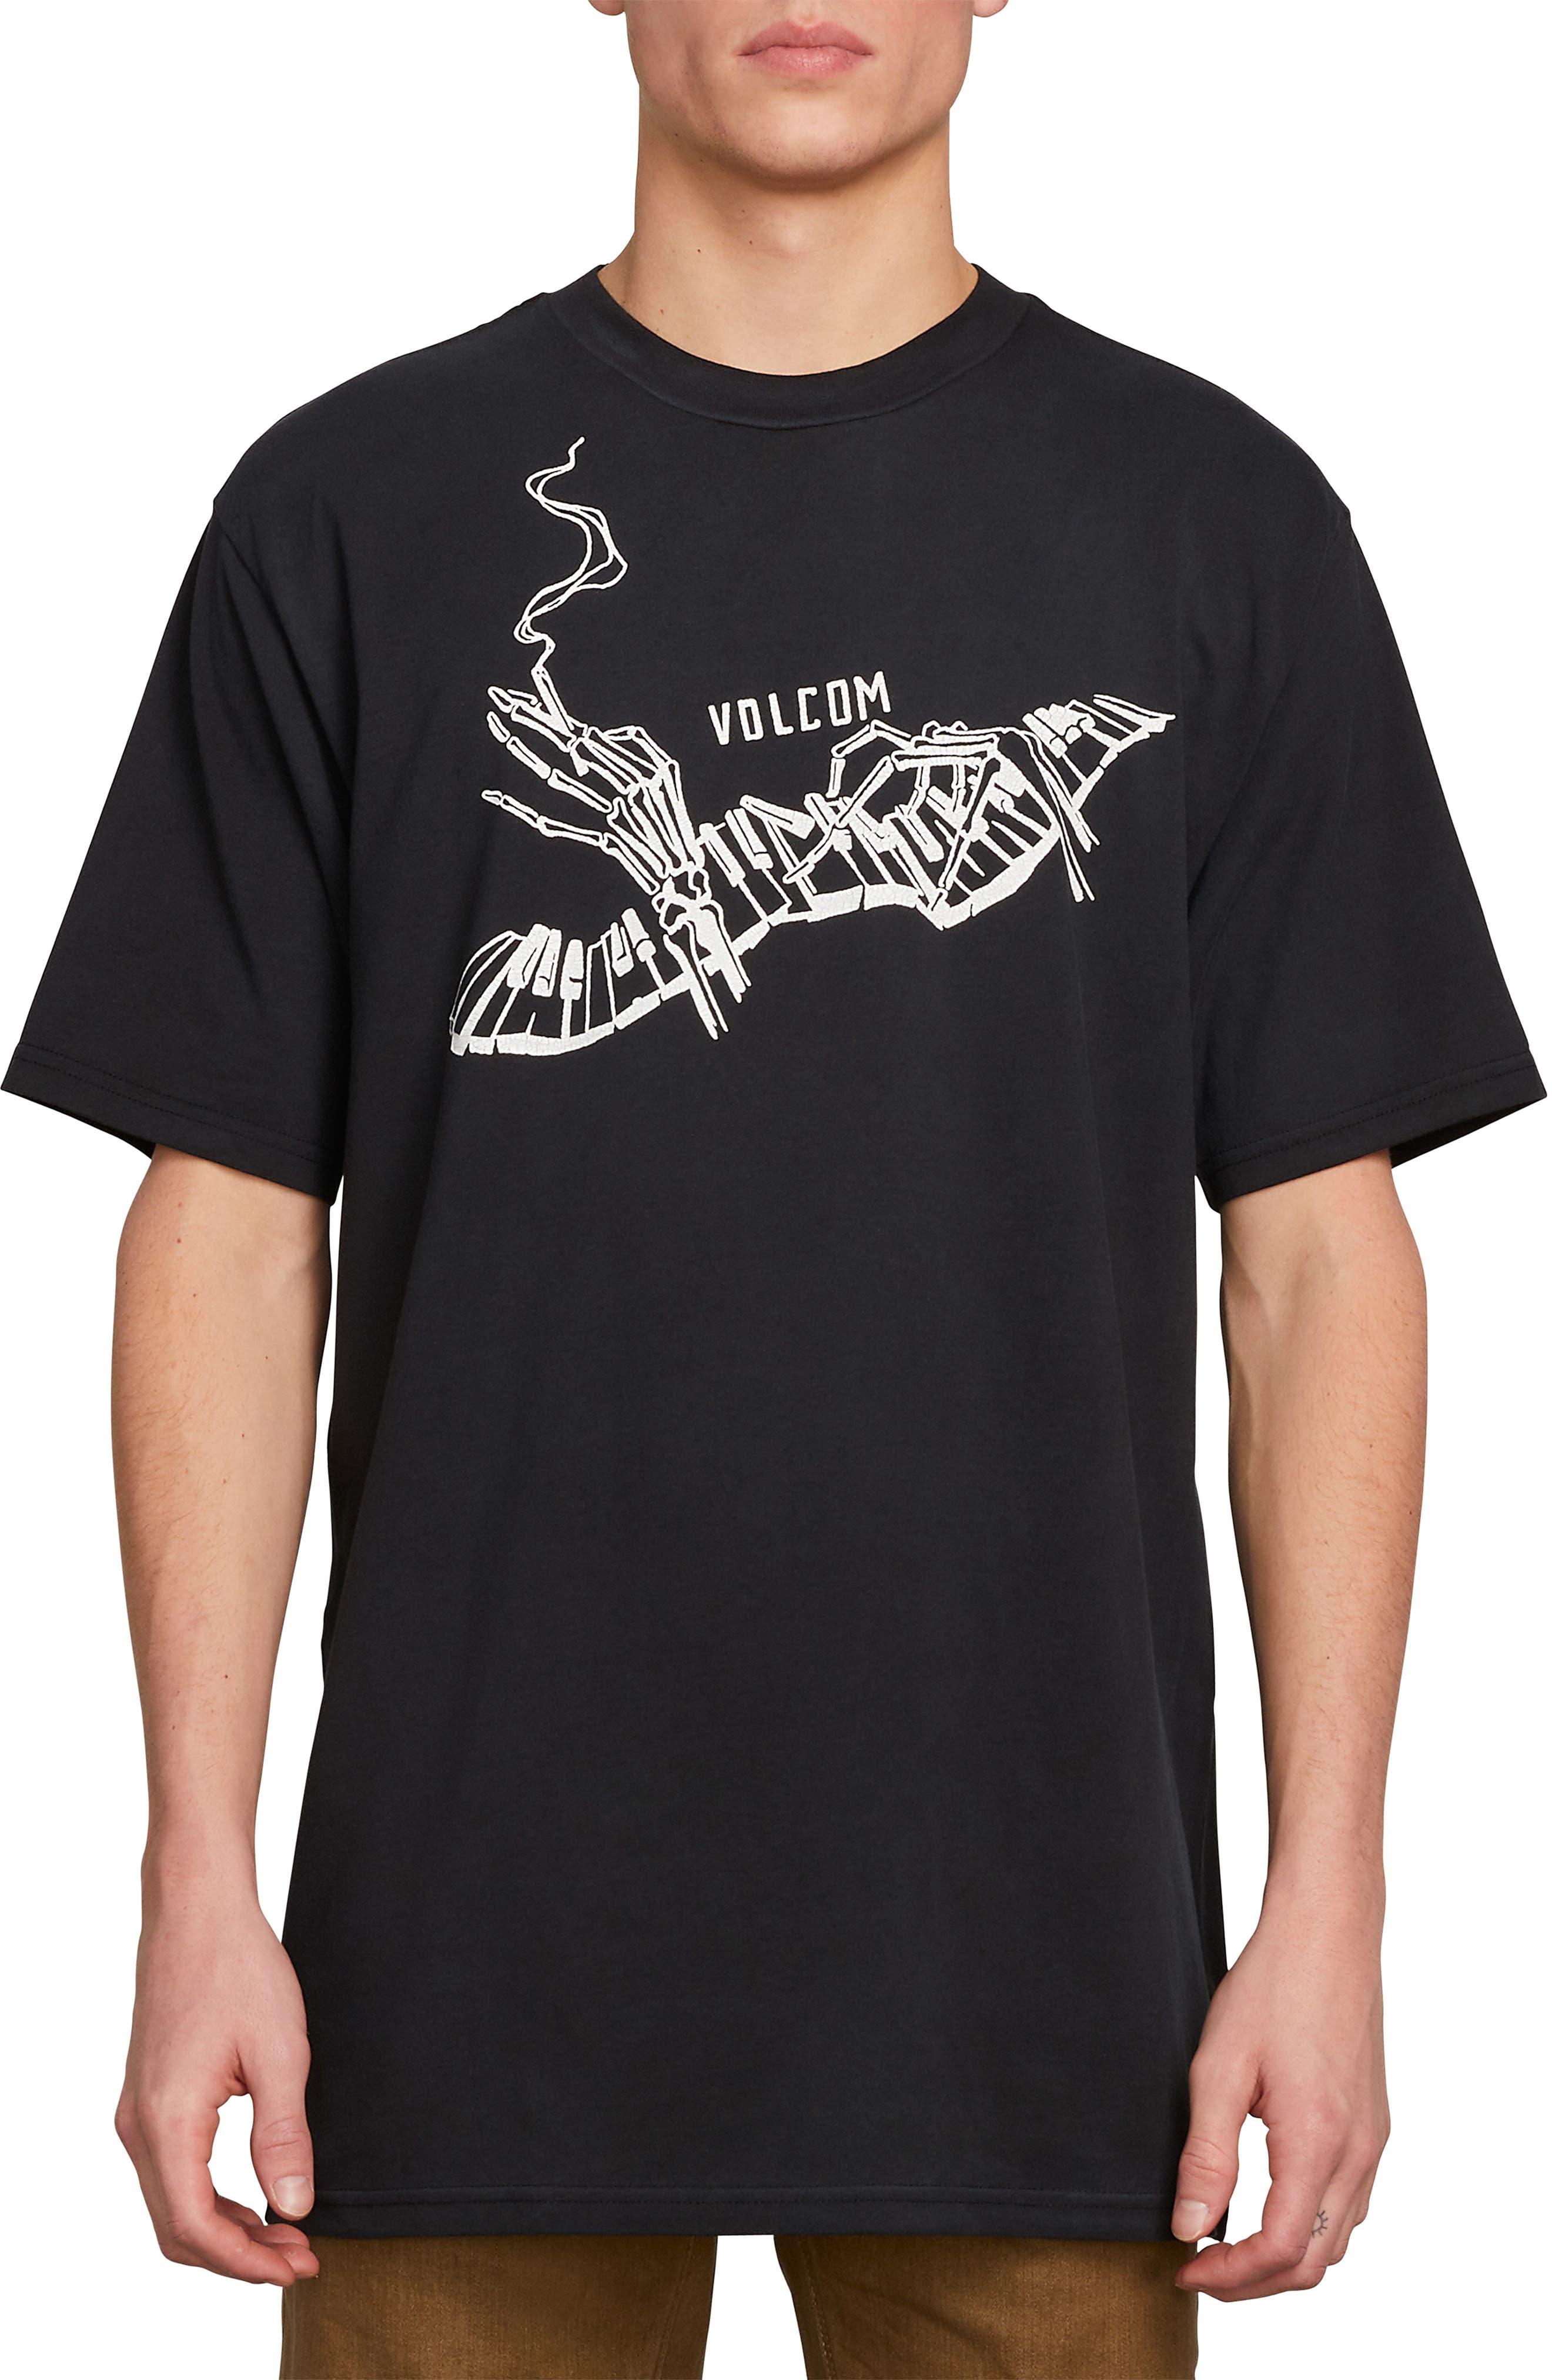 Volcom Death Scale Graphic T-Shirt, Black